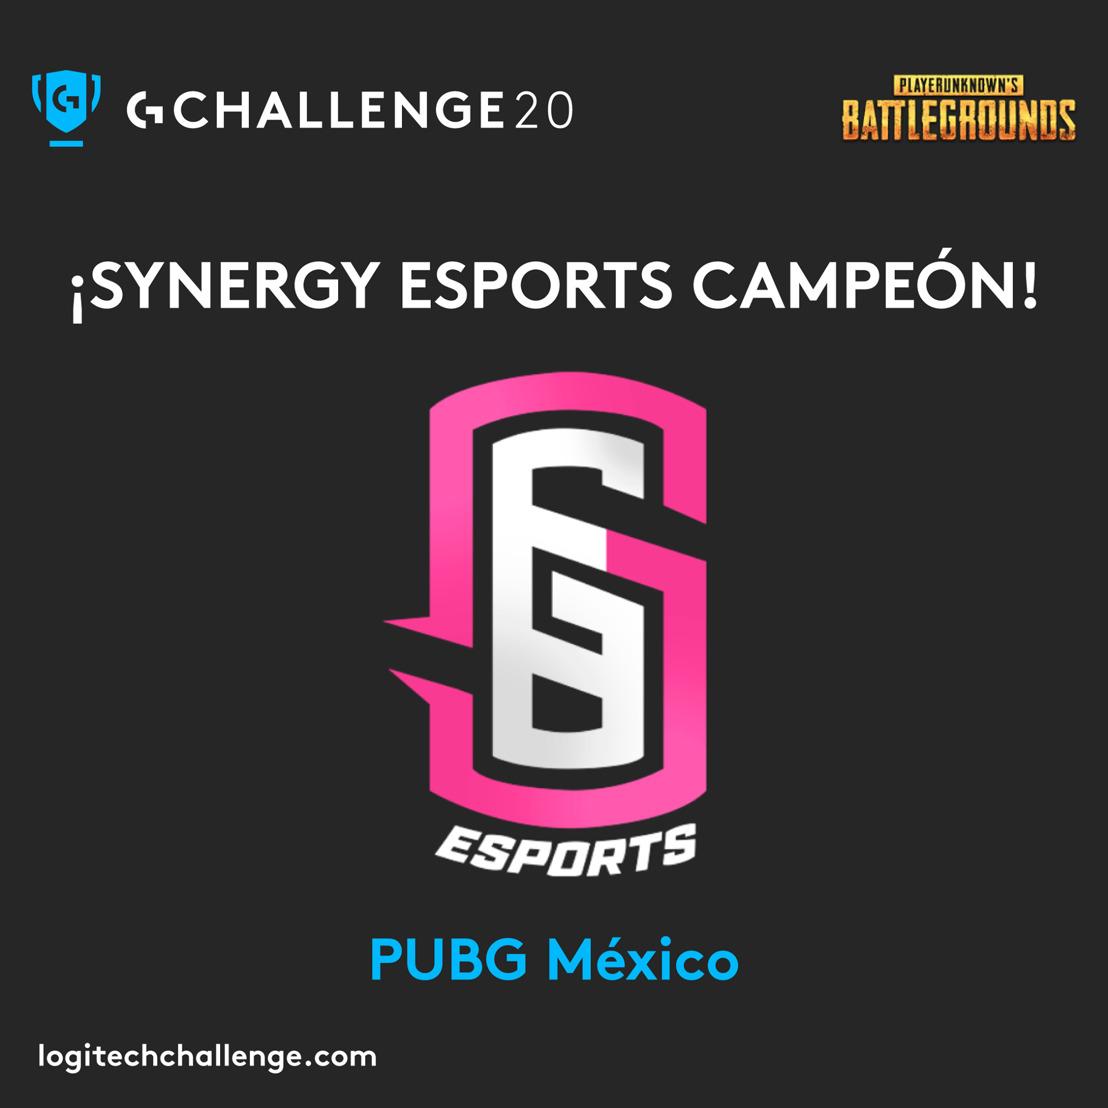 Synergy Esports ganó la final nacional de PUBG en el Logitech G Challenge 2020